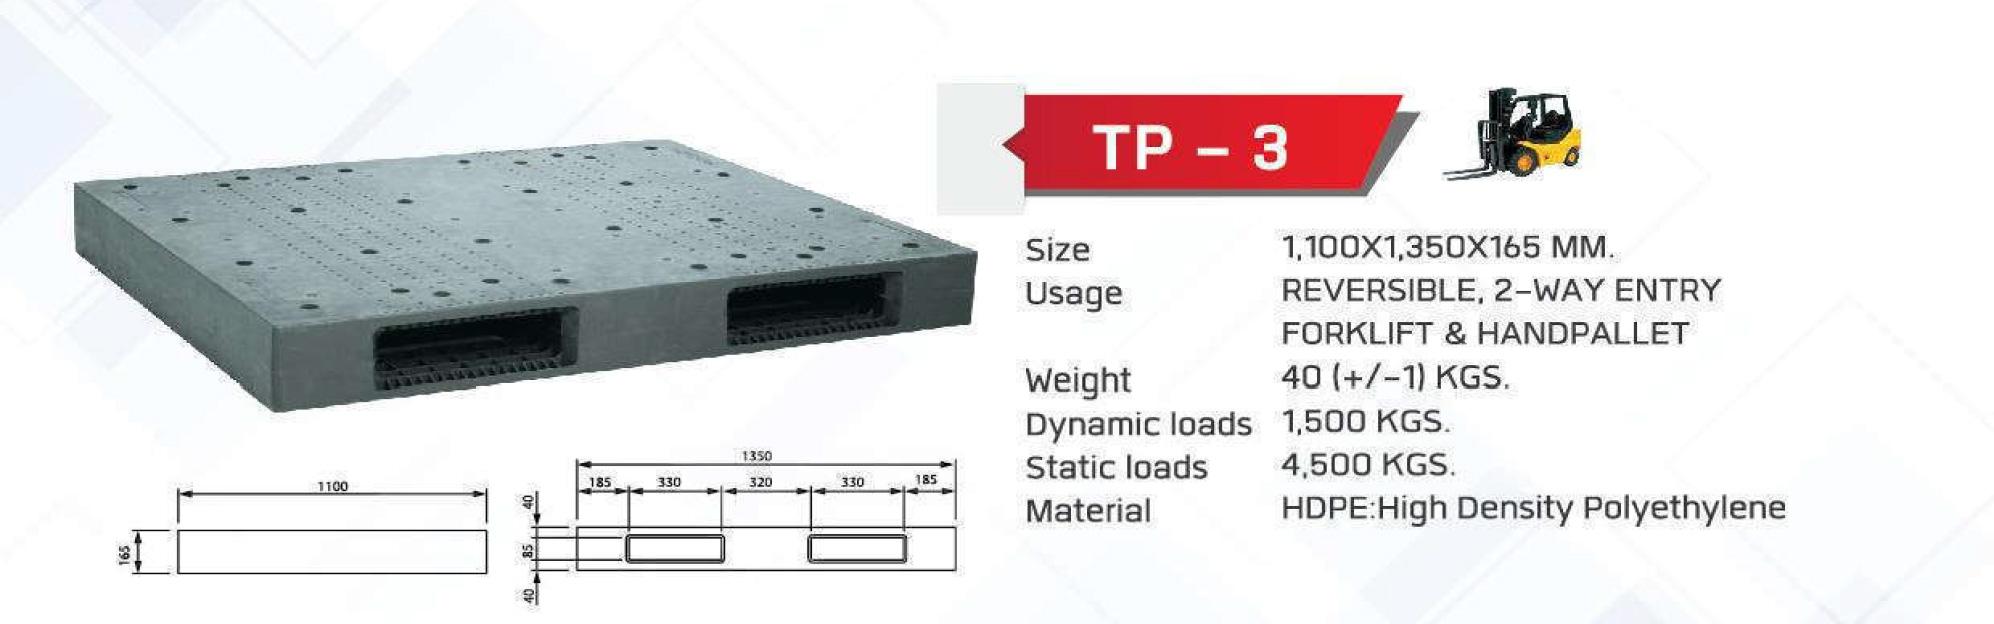 Reversible-HeavyDuty-TP-3